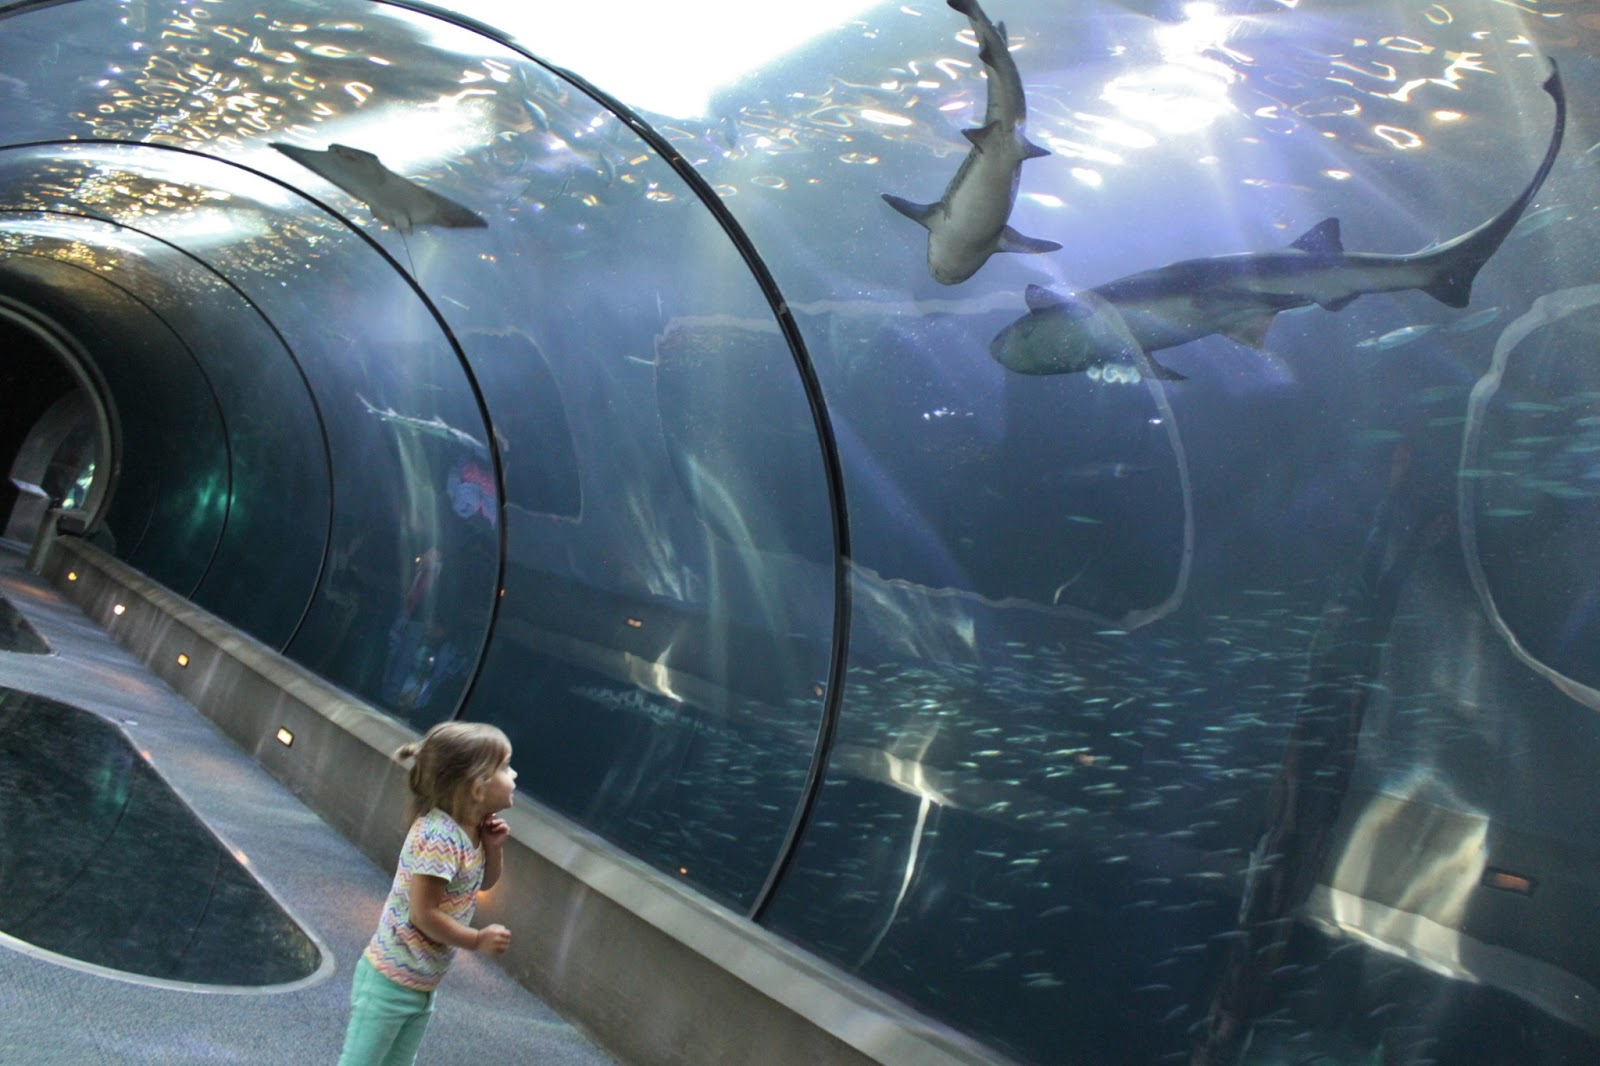 graphic regarding Newport Aquarium Coupons Printable referred to as Discount codes for oregon coastline aquarium - Tesco specials weekend breaks